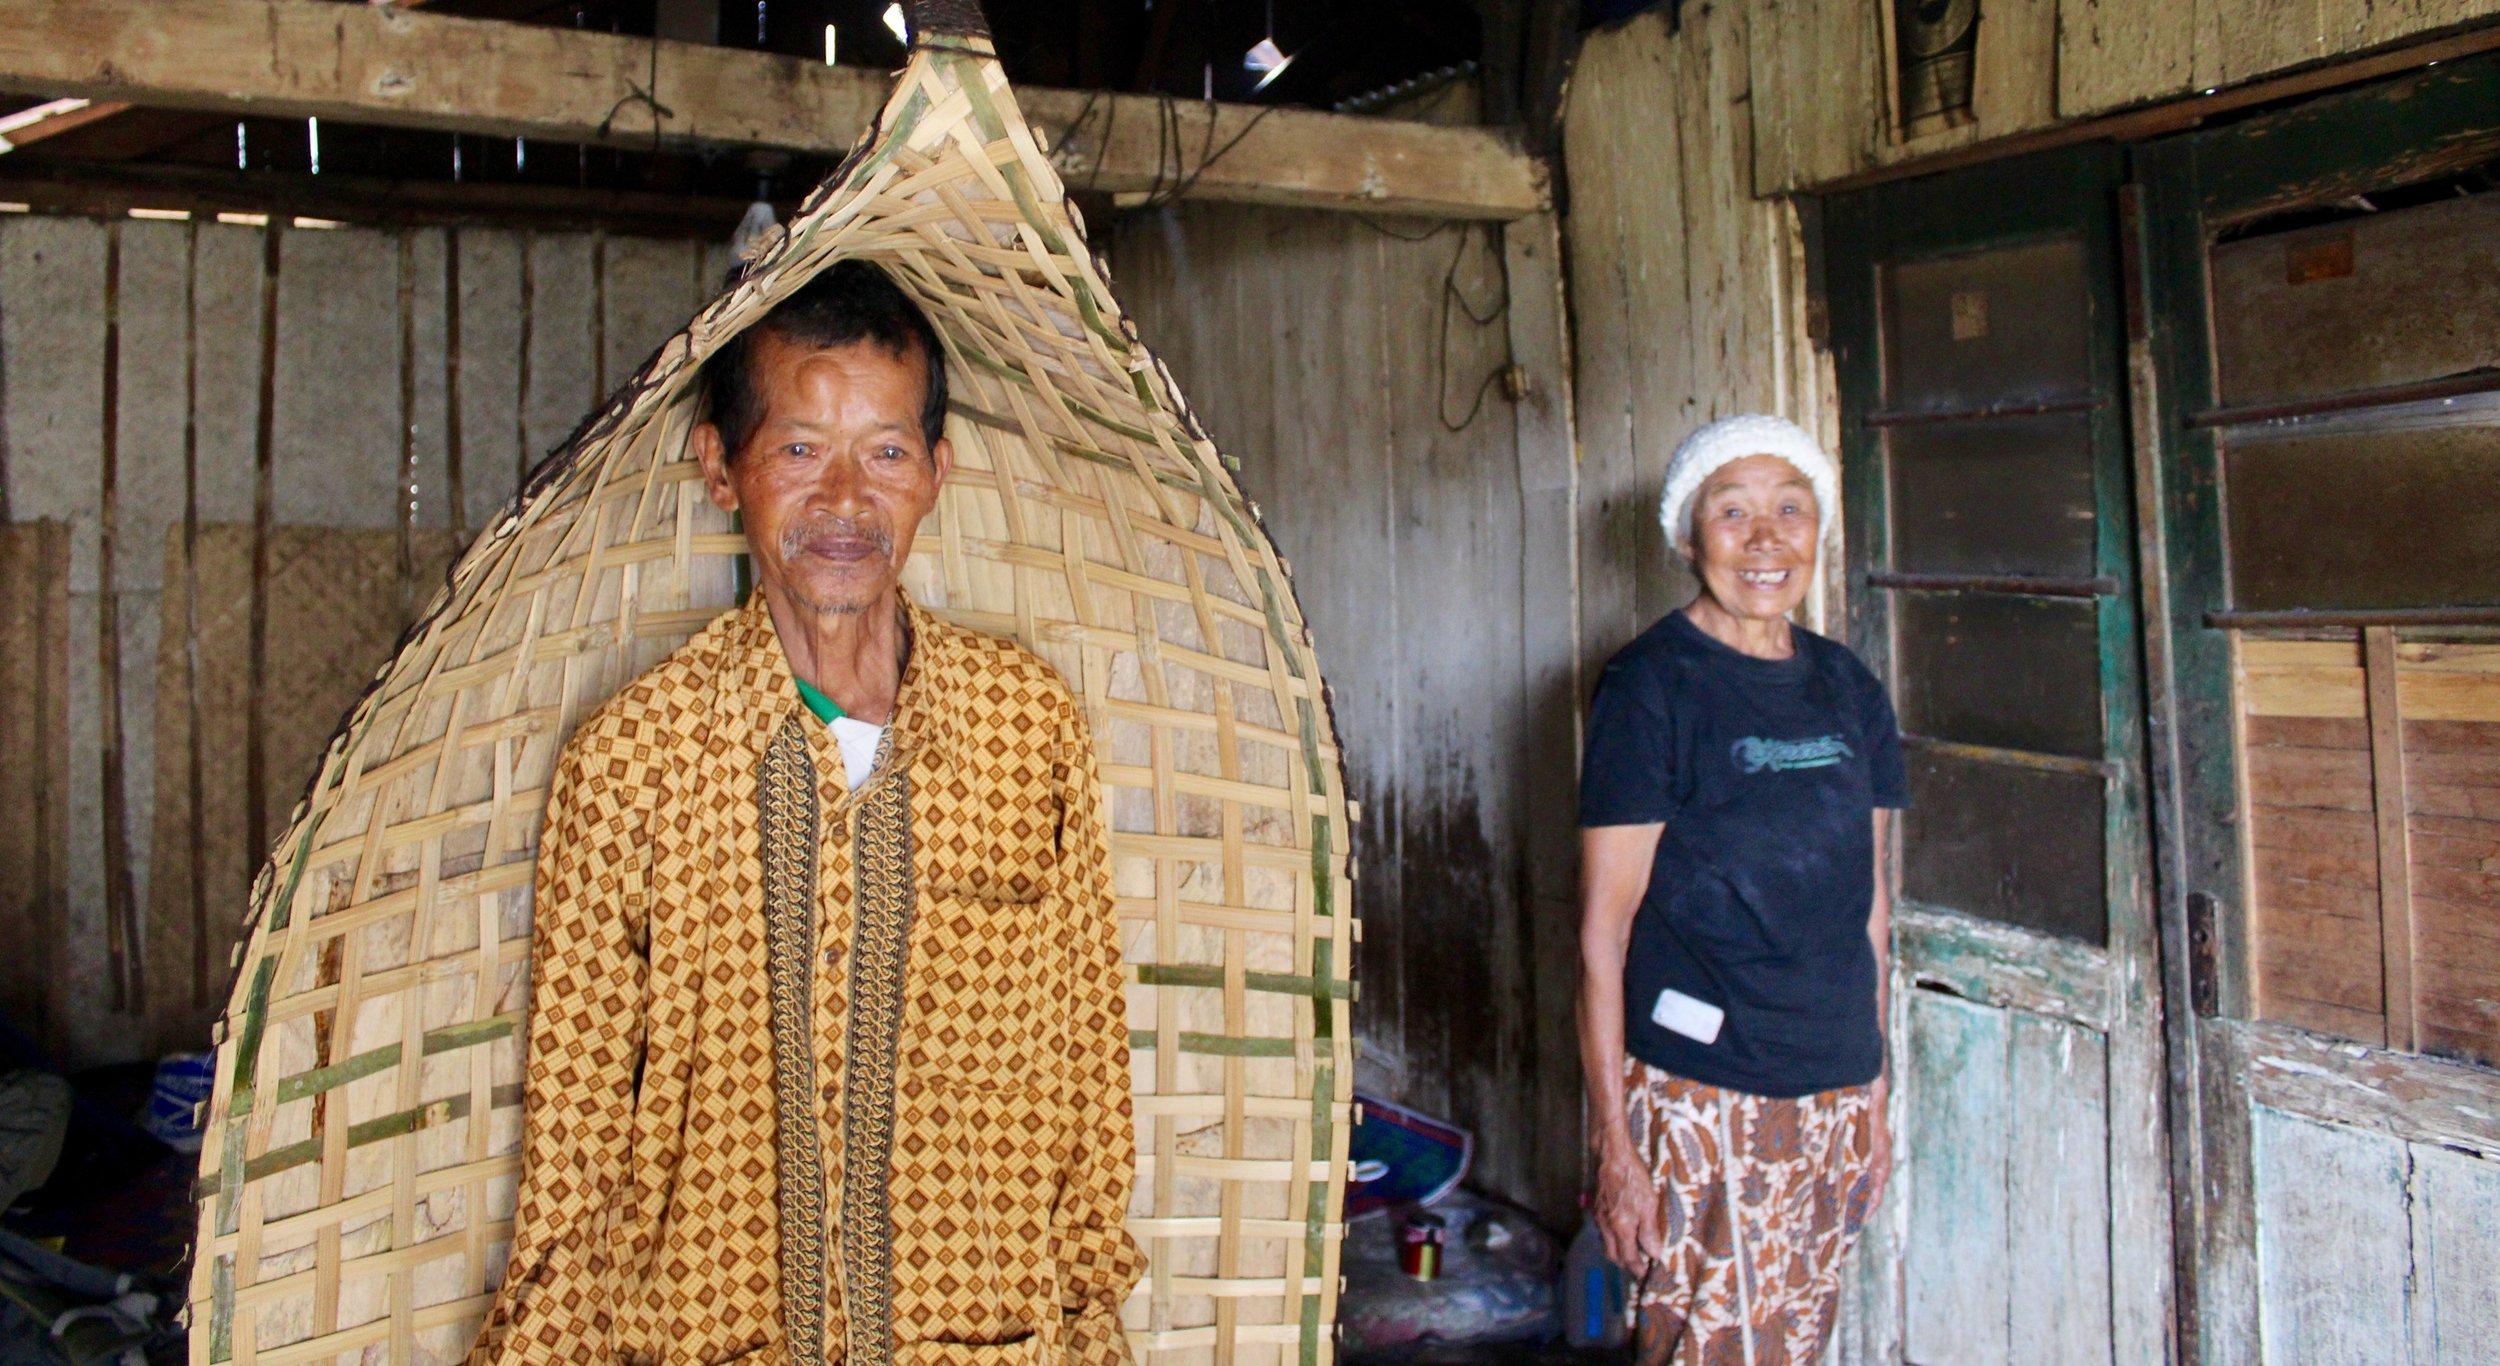 Pak Mahrumi modeling his  kowangan with his wife in their home near Wonosobo